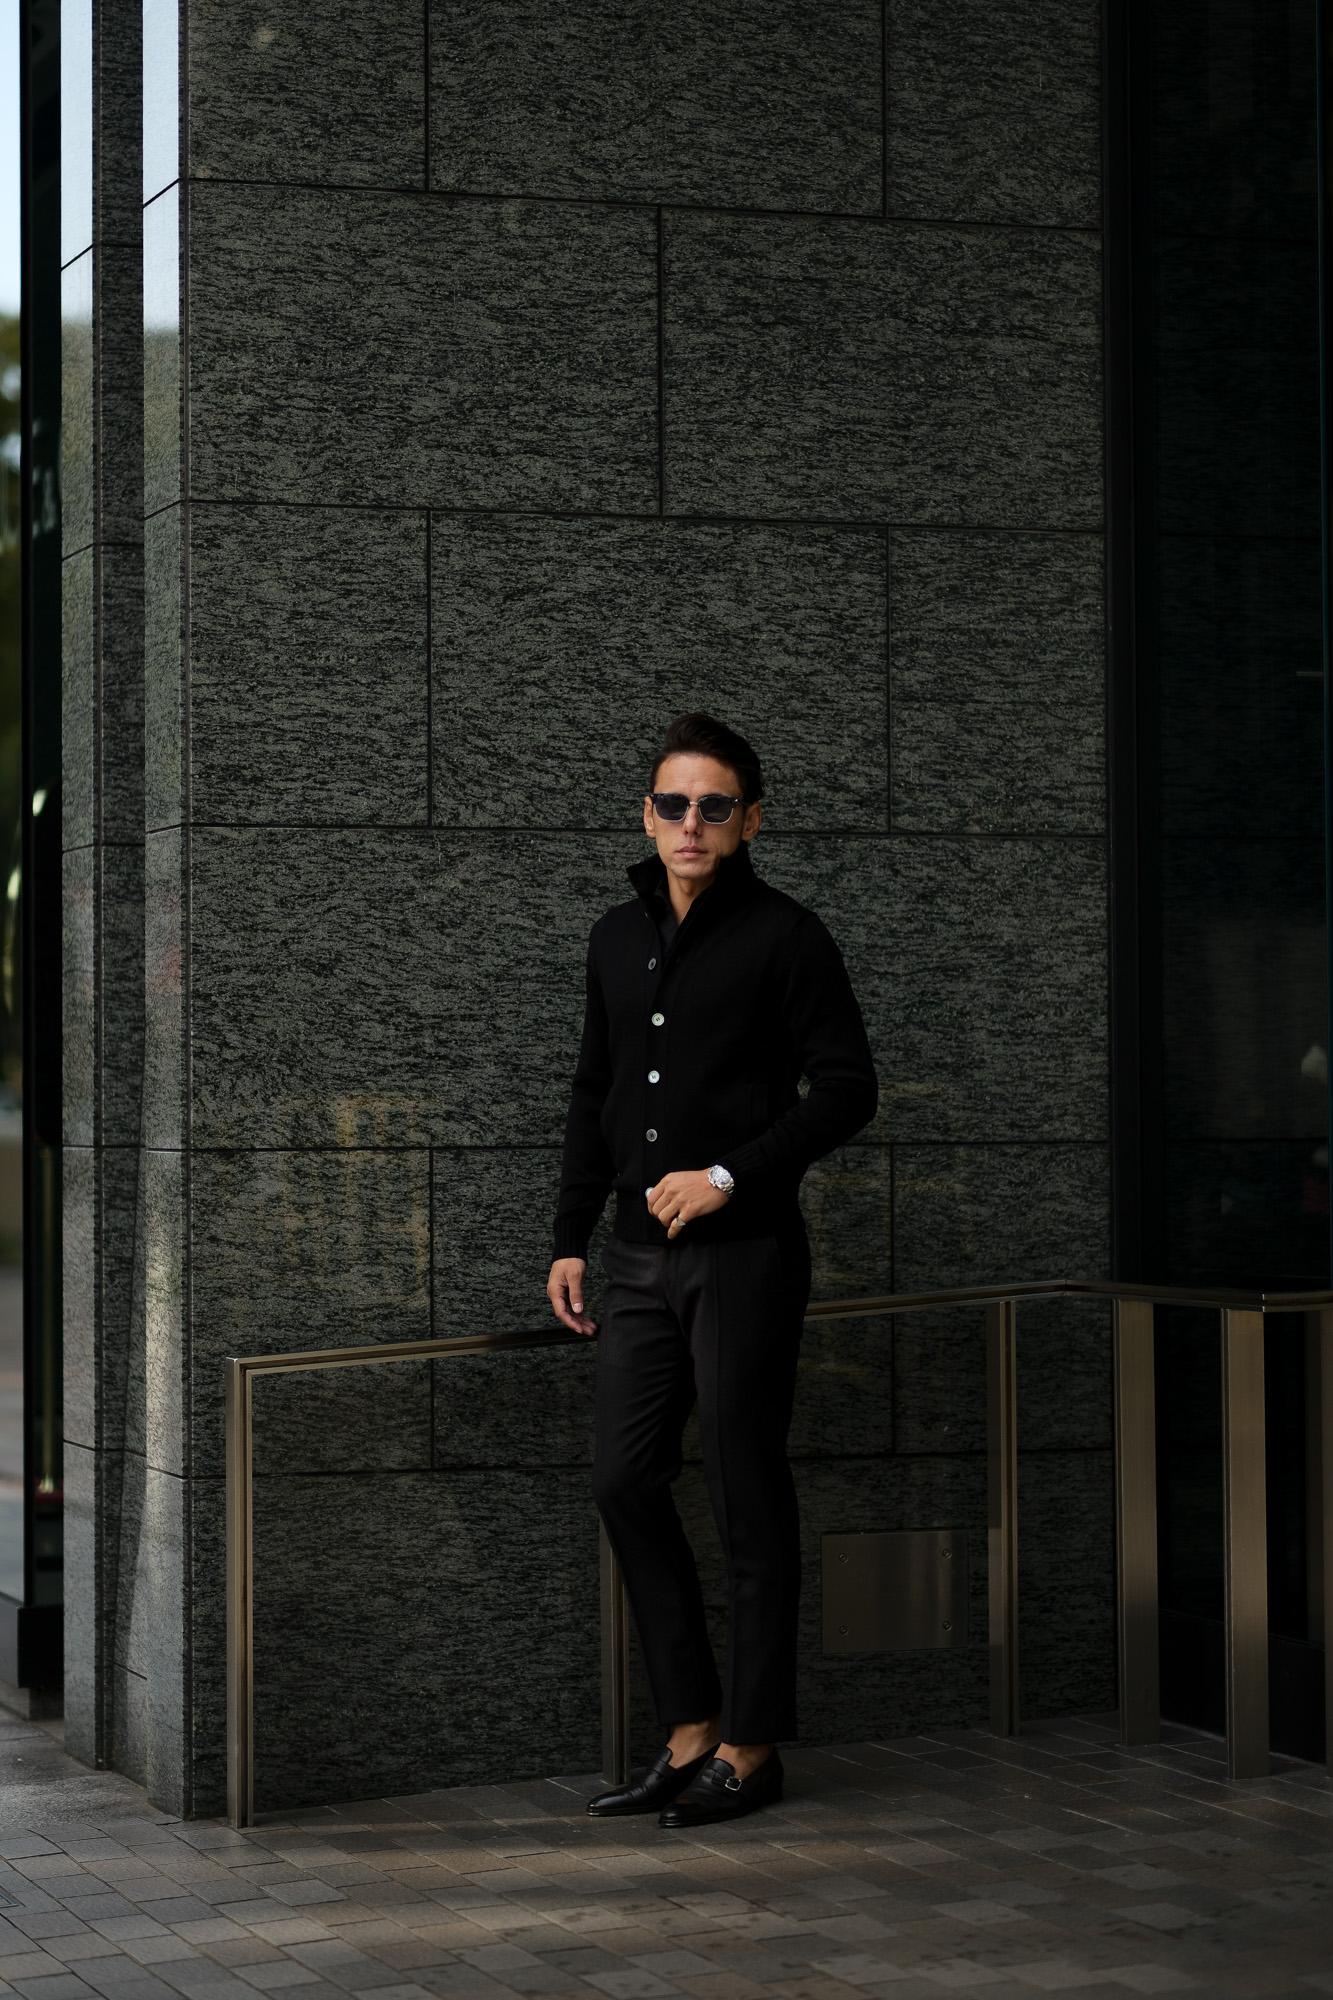 ZANONE ザノーネ CHIOTO KYOTO キョウト キョート ミドルゲージ ニット ジャケット BLACK (ブラック・Z0015) 2020秋冬新作 入荷しました フリー分発売開始 愛知 名古屋 Alto e Diritto アルトエデリット